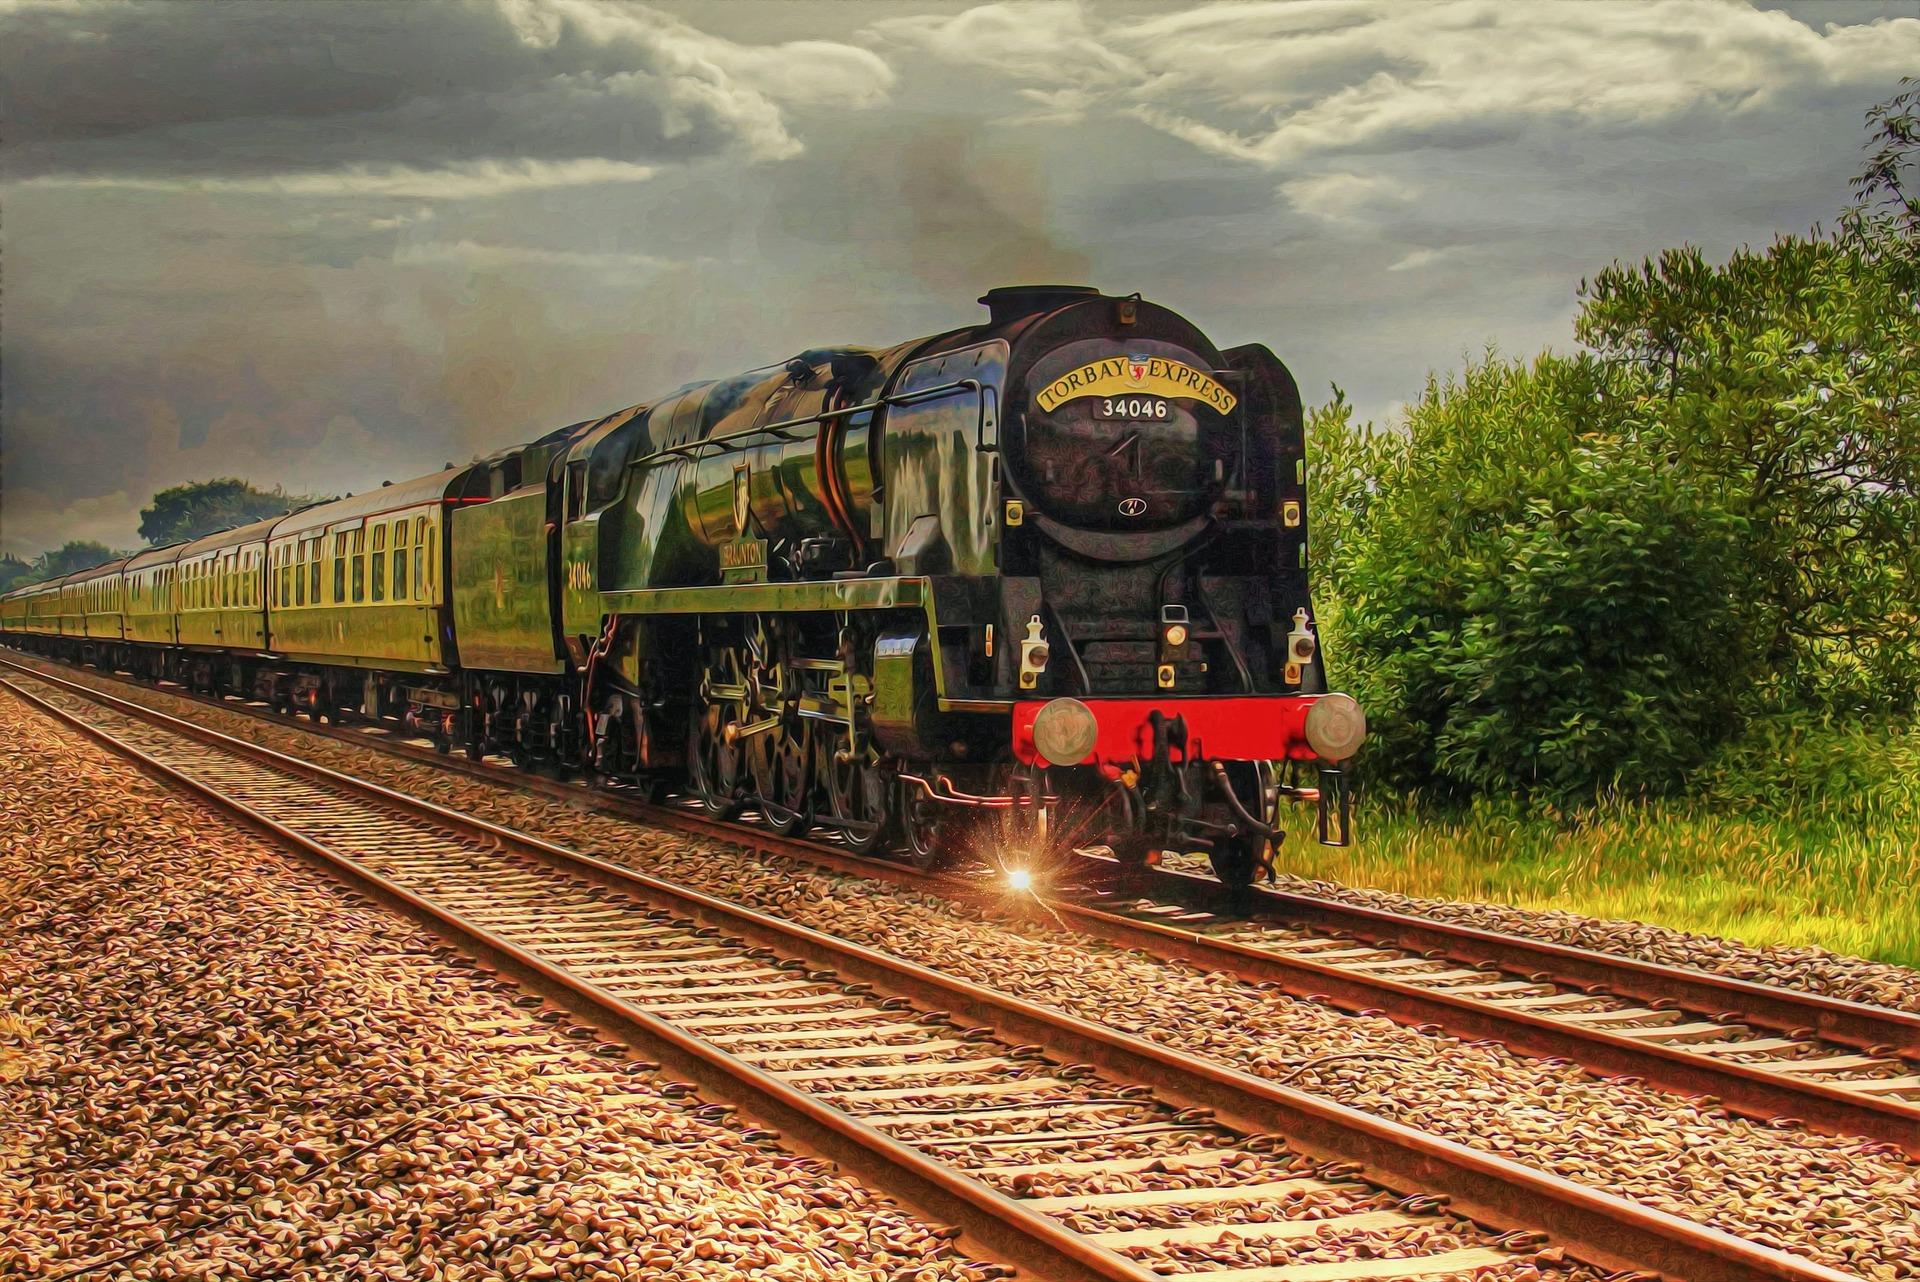 train-2981443_1920